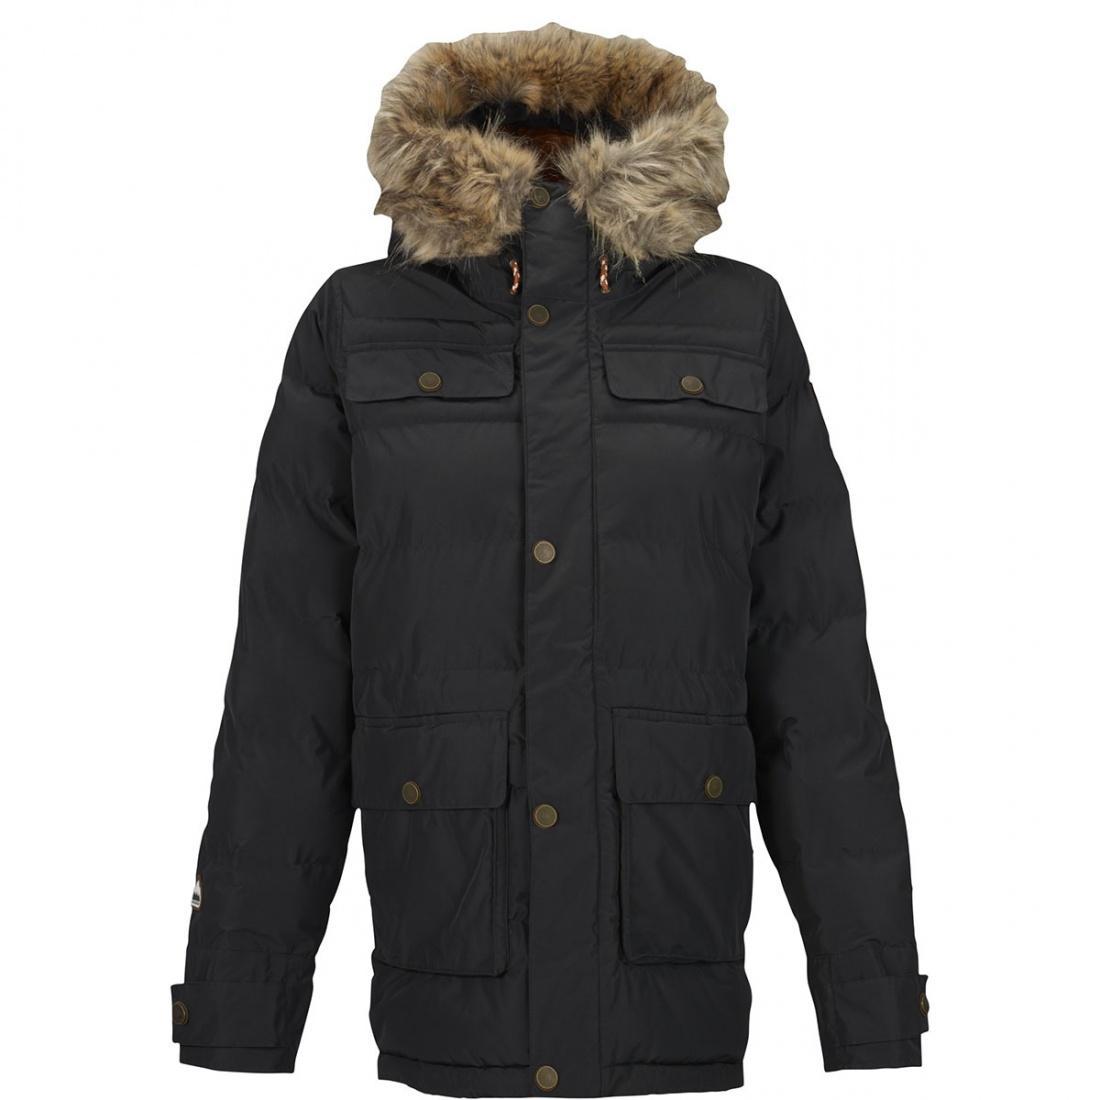 Куртка г/л WB ESSEX PUFFY JKКуртки<br>Удобная мужская куртка<br><br>Мембрана: 10,000mm/ 10,000 g<br>Двухслойный водоотталкивающий материал DRYRIDE Durashell™<br>Утеплитель: bluesign® THERMOLITE® <br>Дышащая подкладка Living Lining™<br>Стандартный крой&lt;...<br><br>Цвет: Черный<br>Размер: M